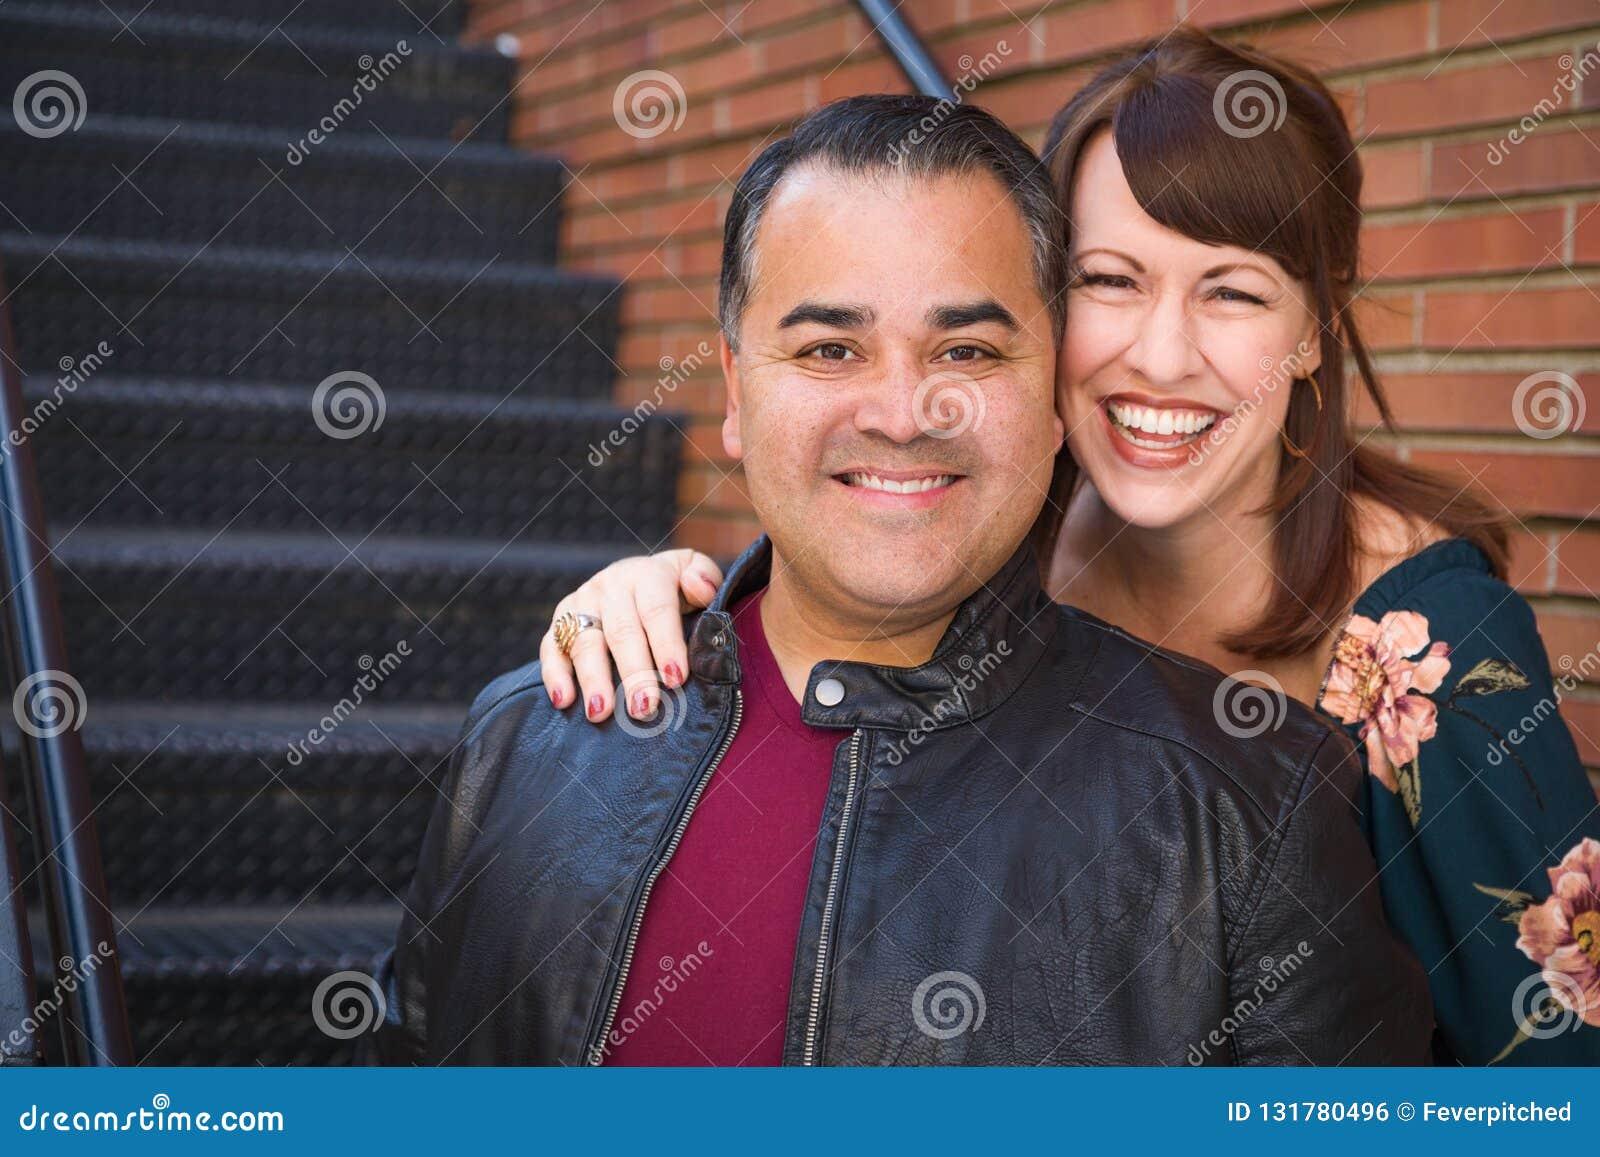 Laughing Mixed Race Caucasian Woman and Hispanic Man